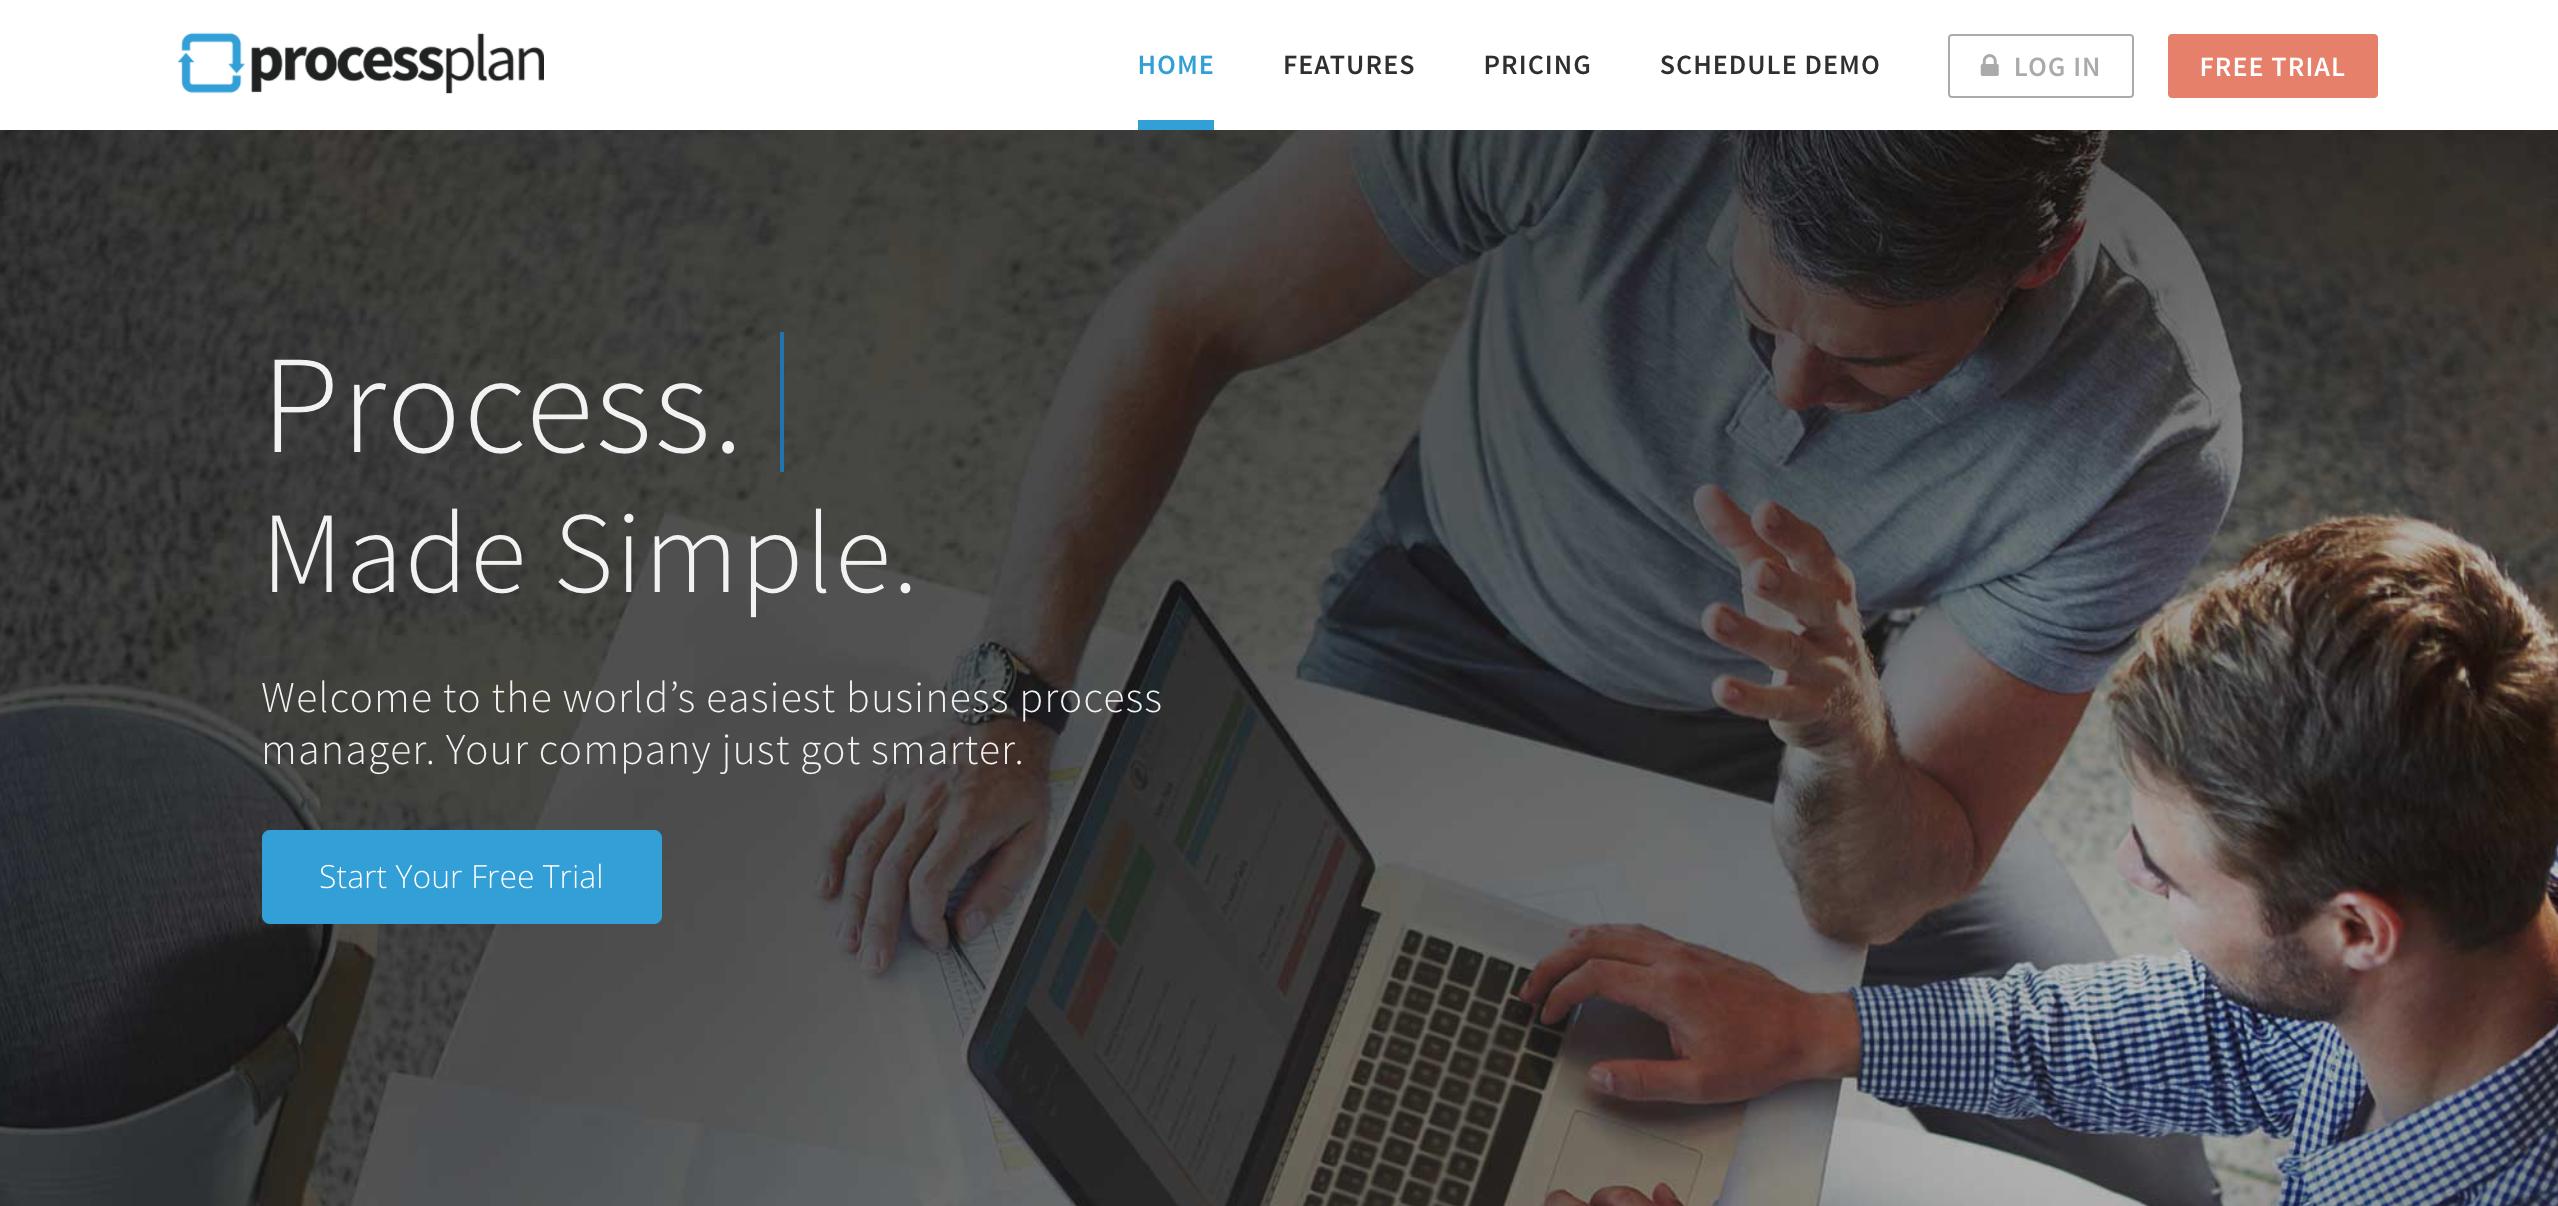 ProcessPlan-Website-Screenshot